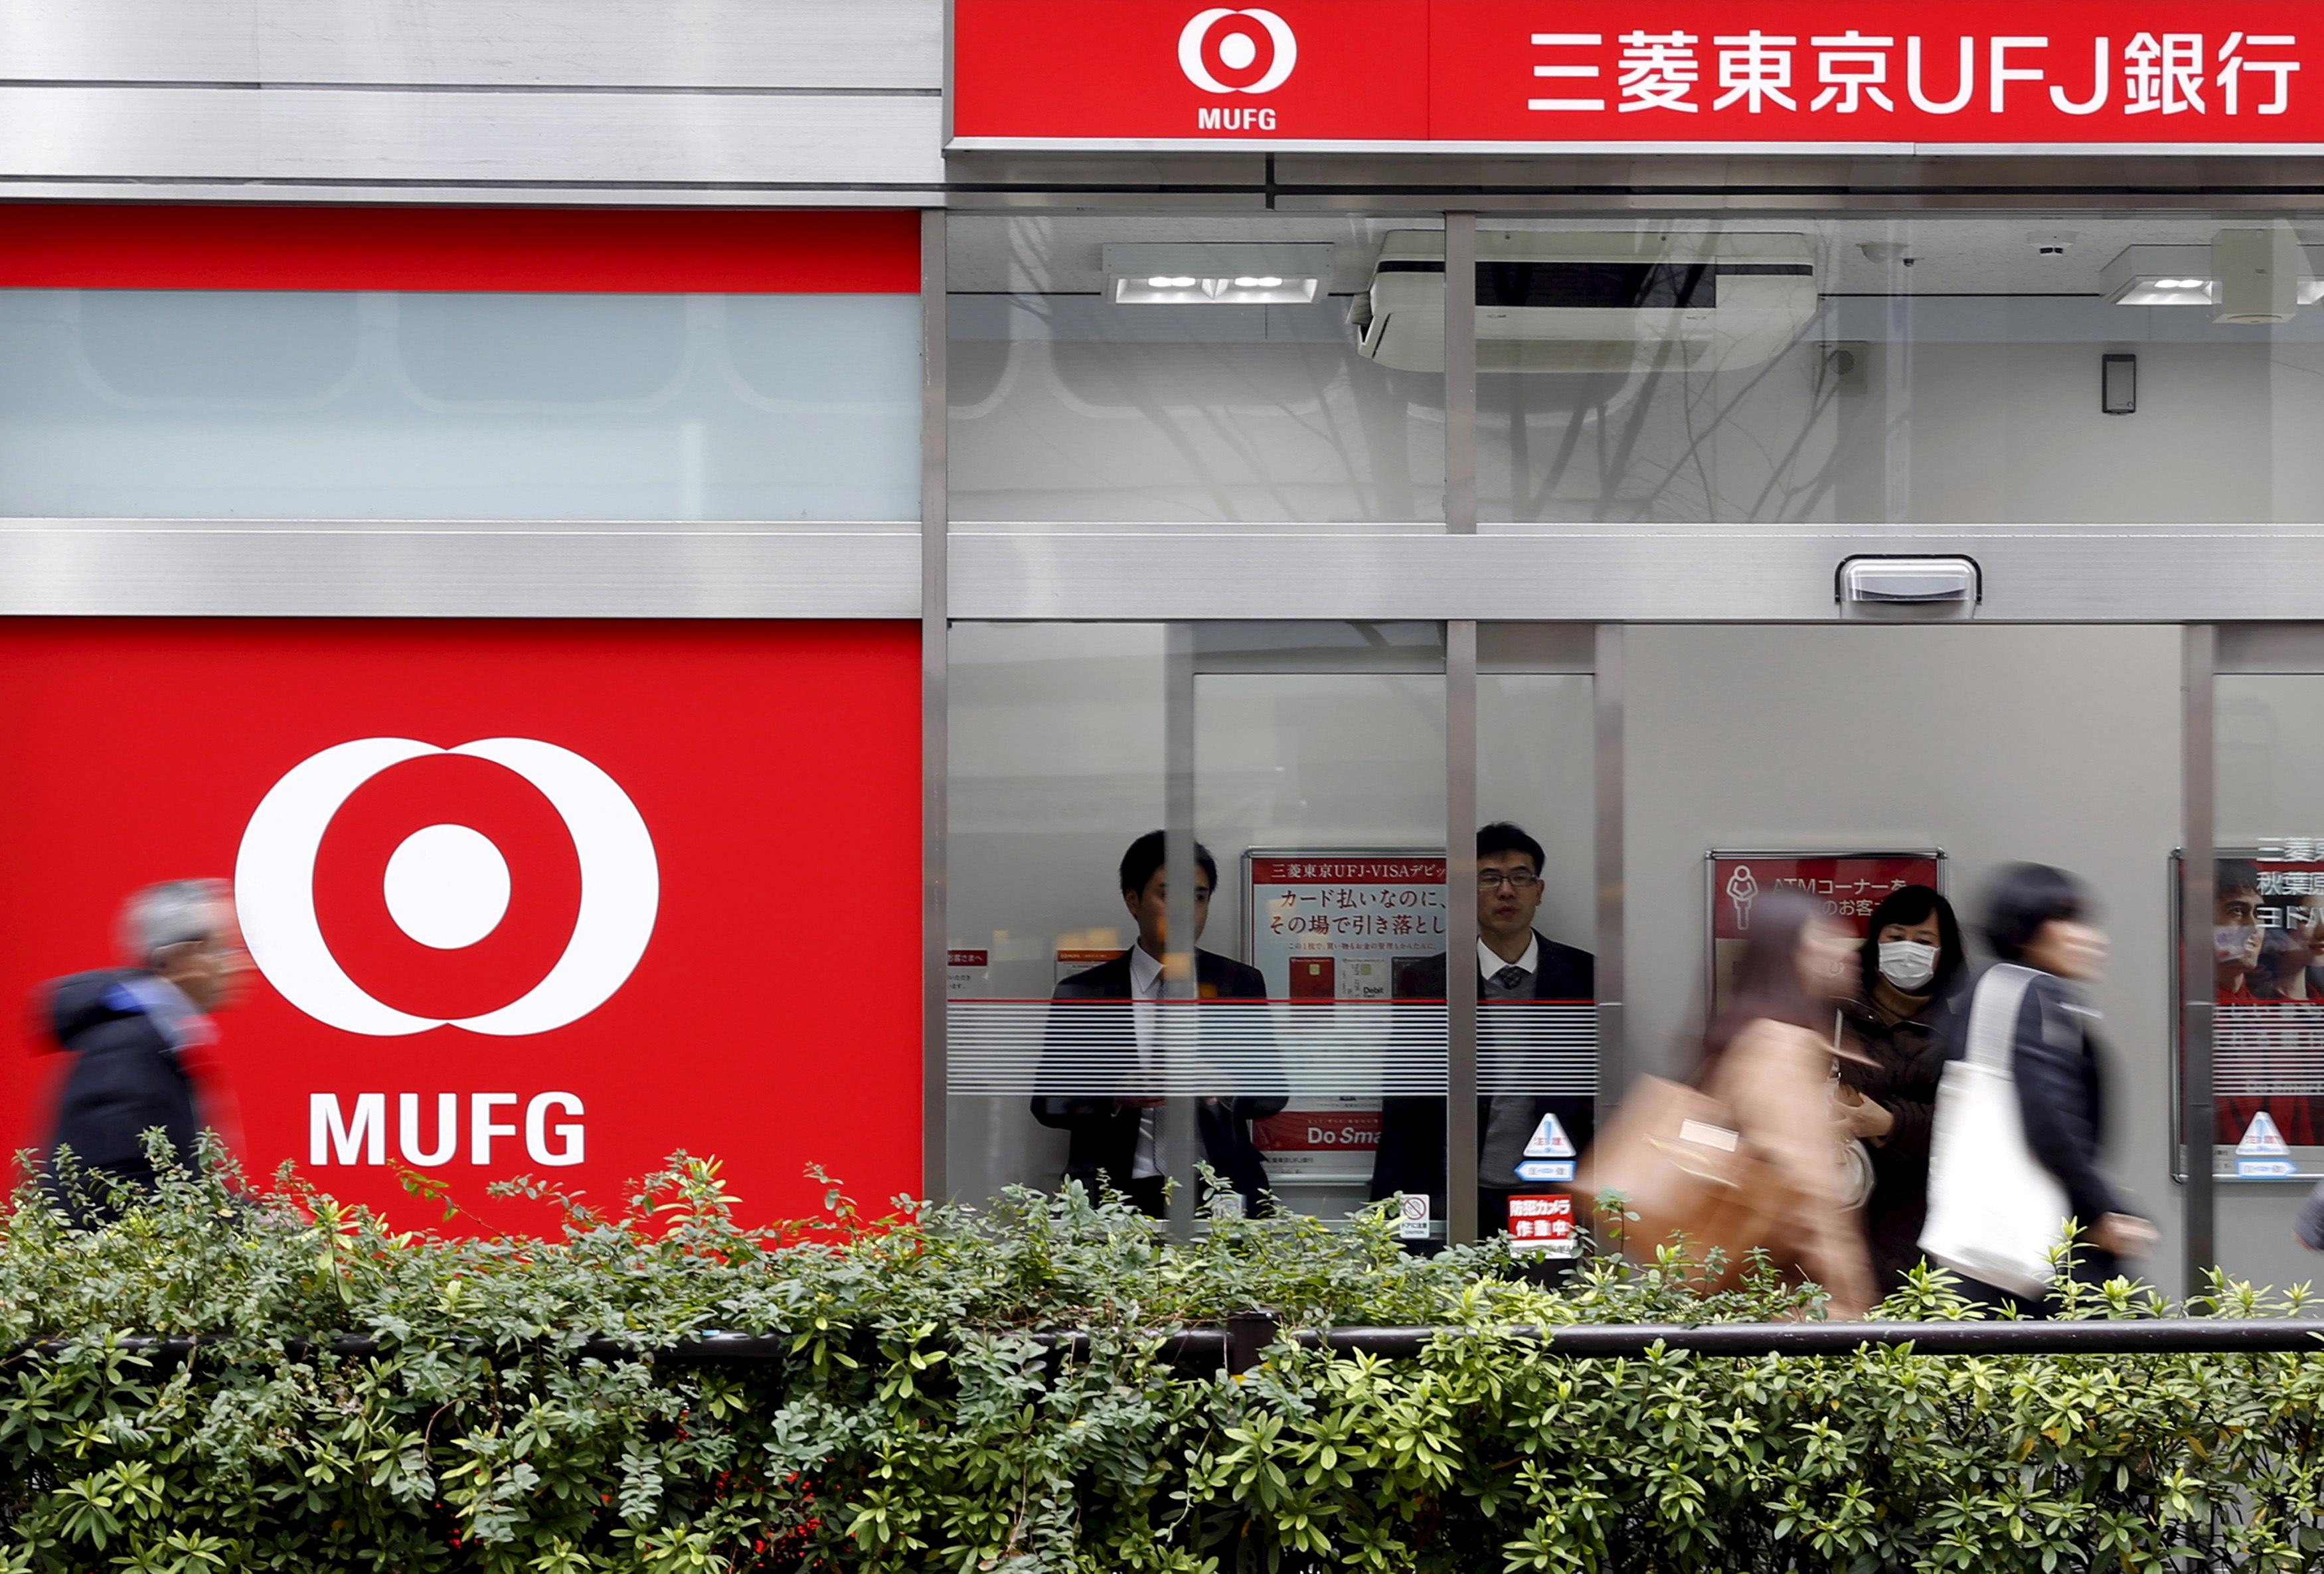 People queue inside a branch of the Mitsubishi UFJ (MUFJ) Financial Group's bank of Tokyo-Mitsubishi UFJ in Tokyo, Japan, February 1, 2016. REUTERS/Yuya Shino/File Photo